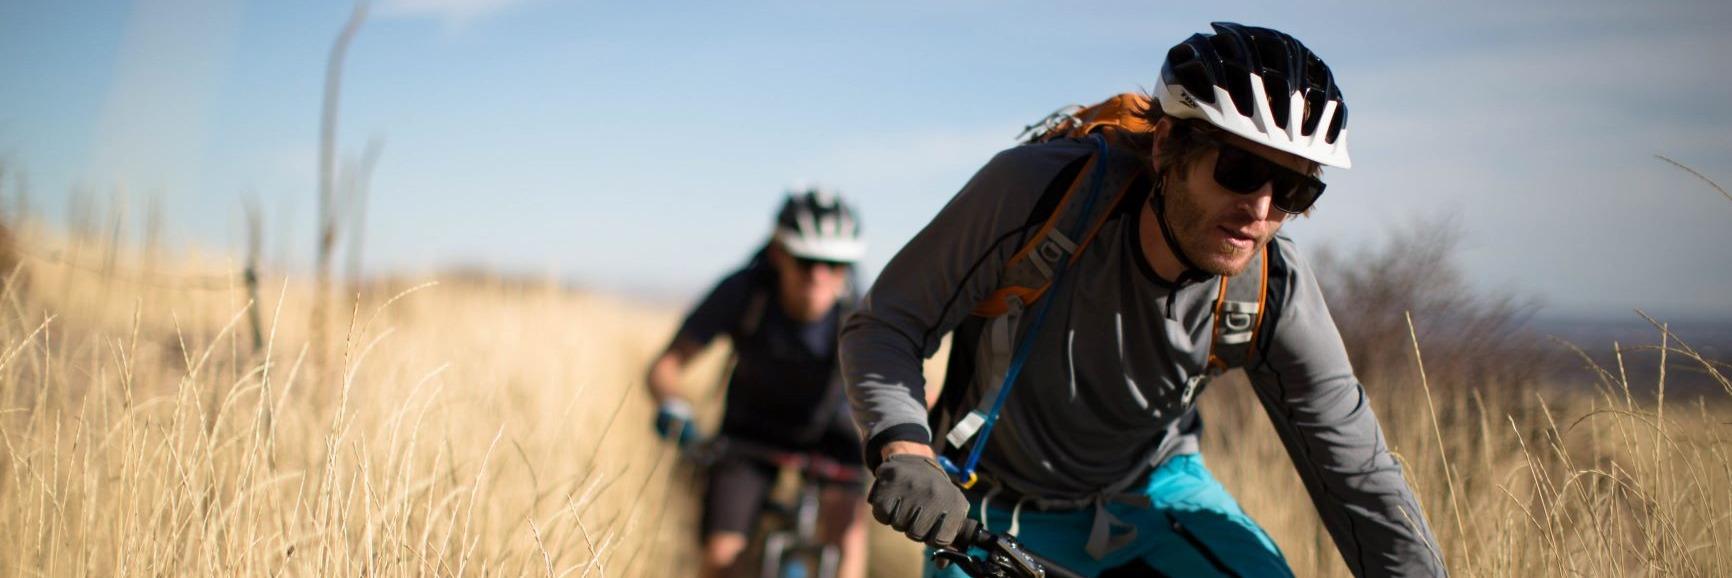 Mountain biker riders on a mountain meadow trail